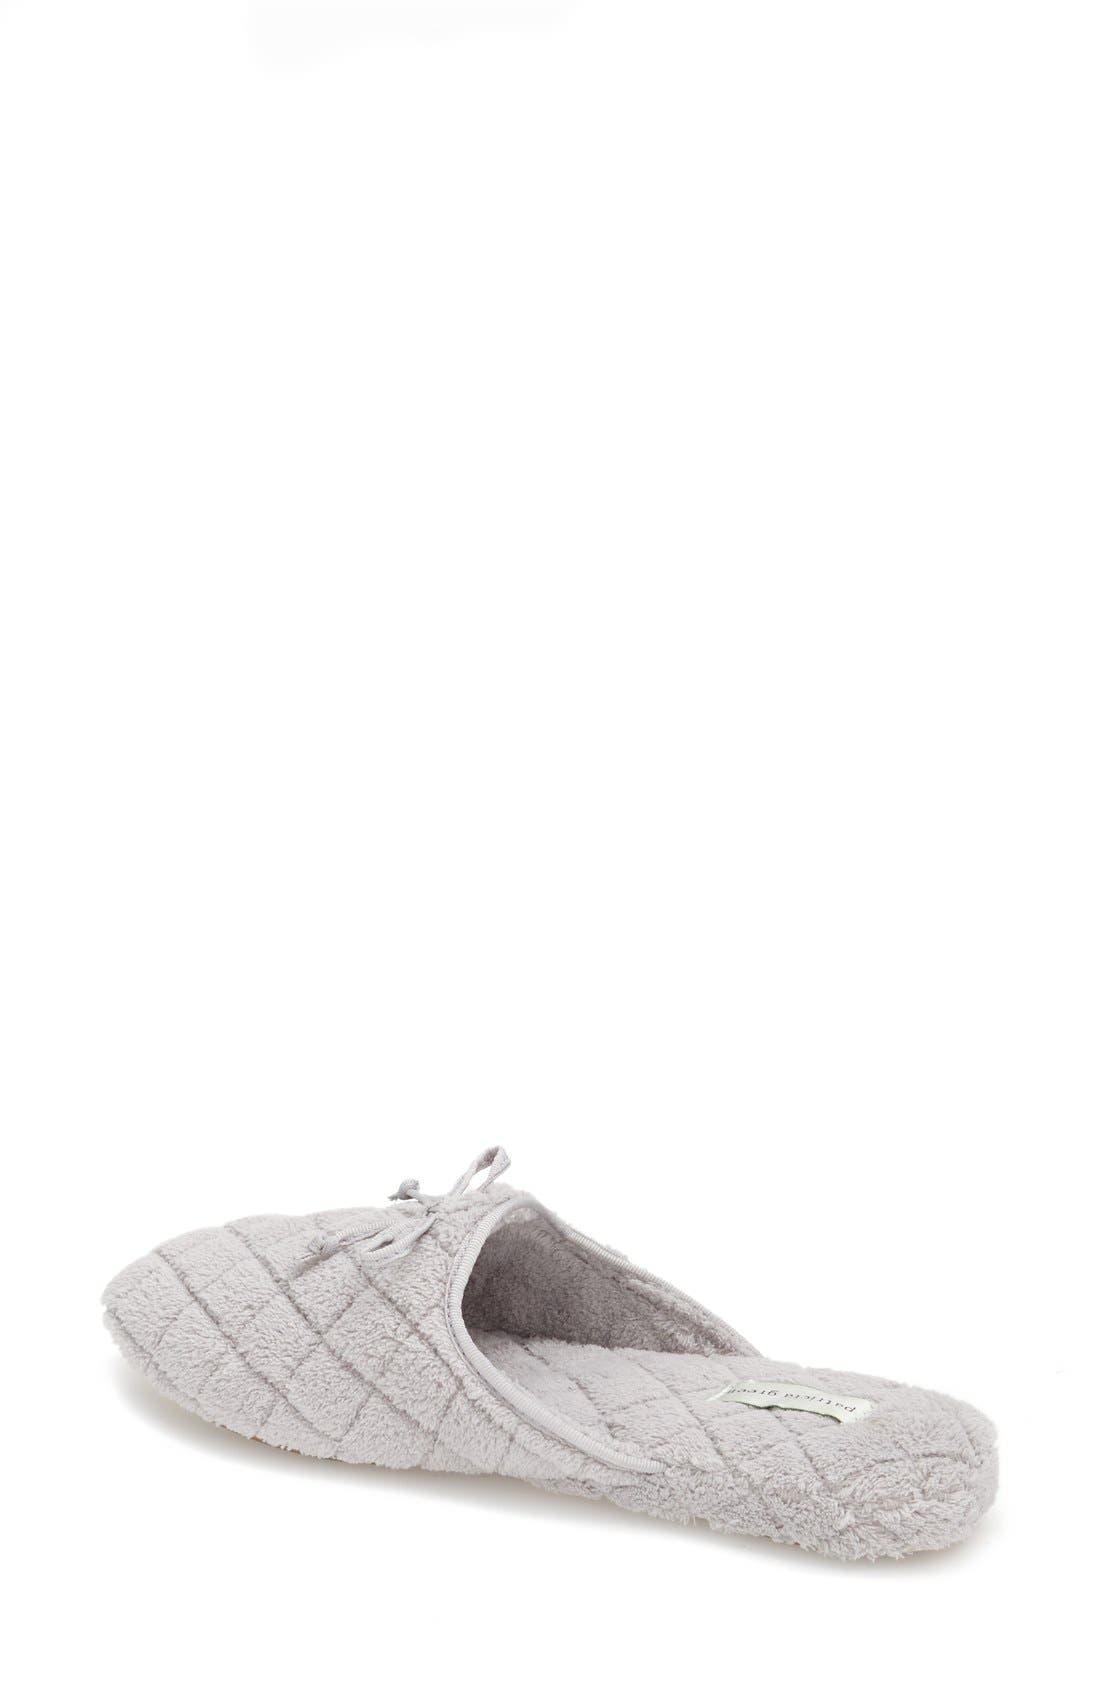 30a5ffb640e Women s Patricia Green Shoes